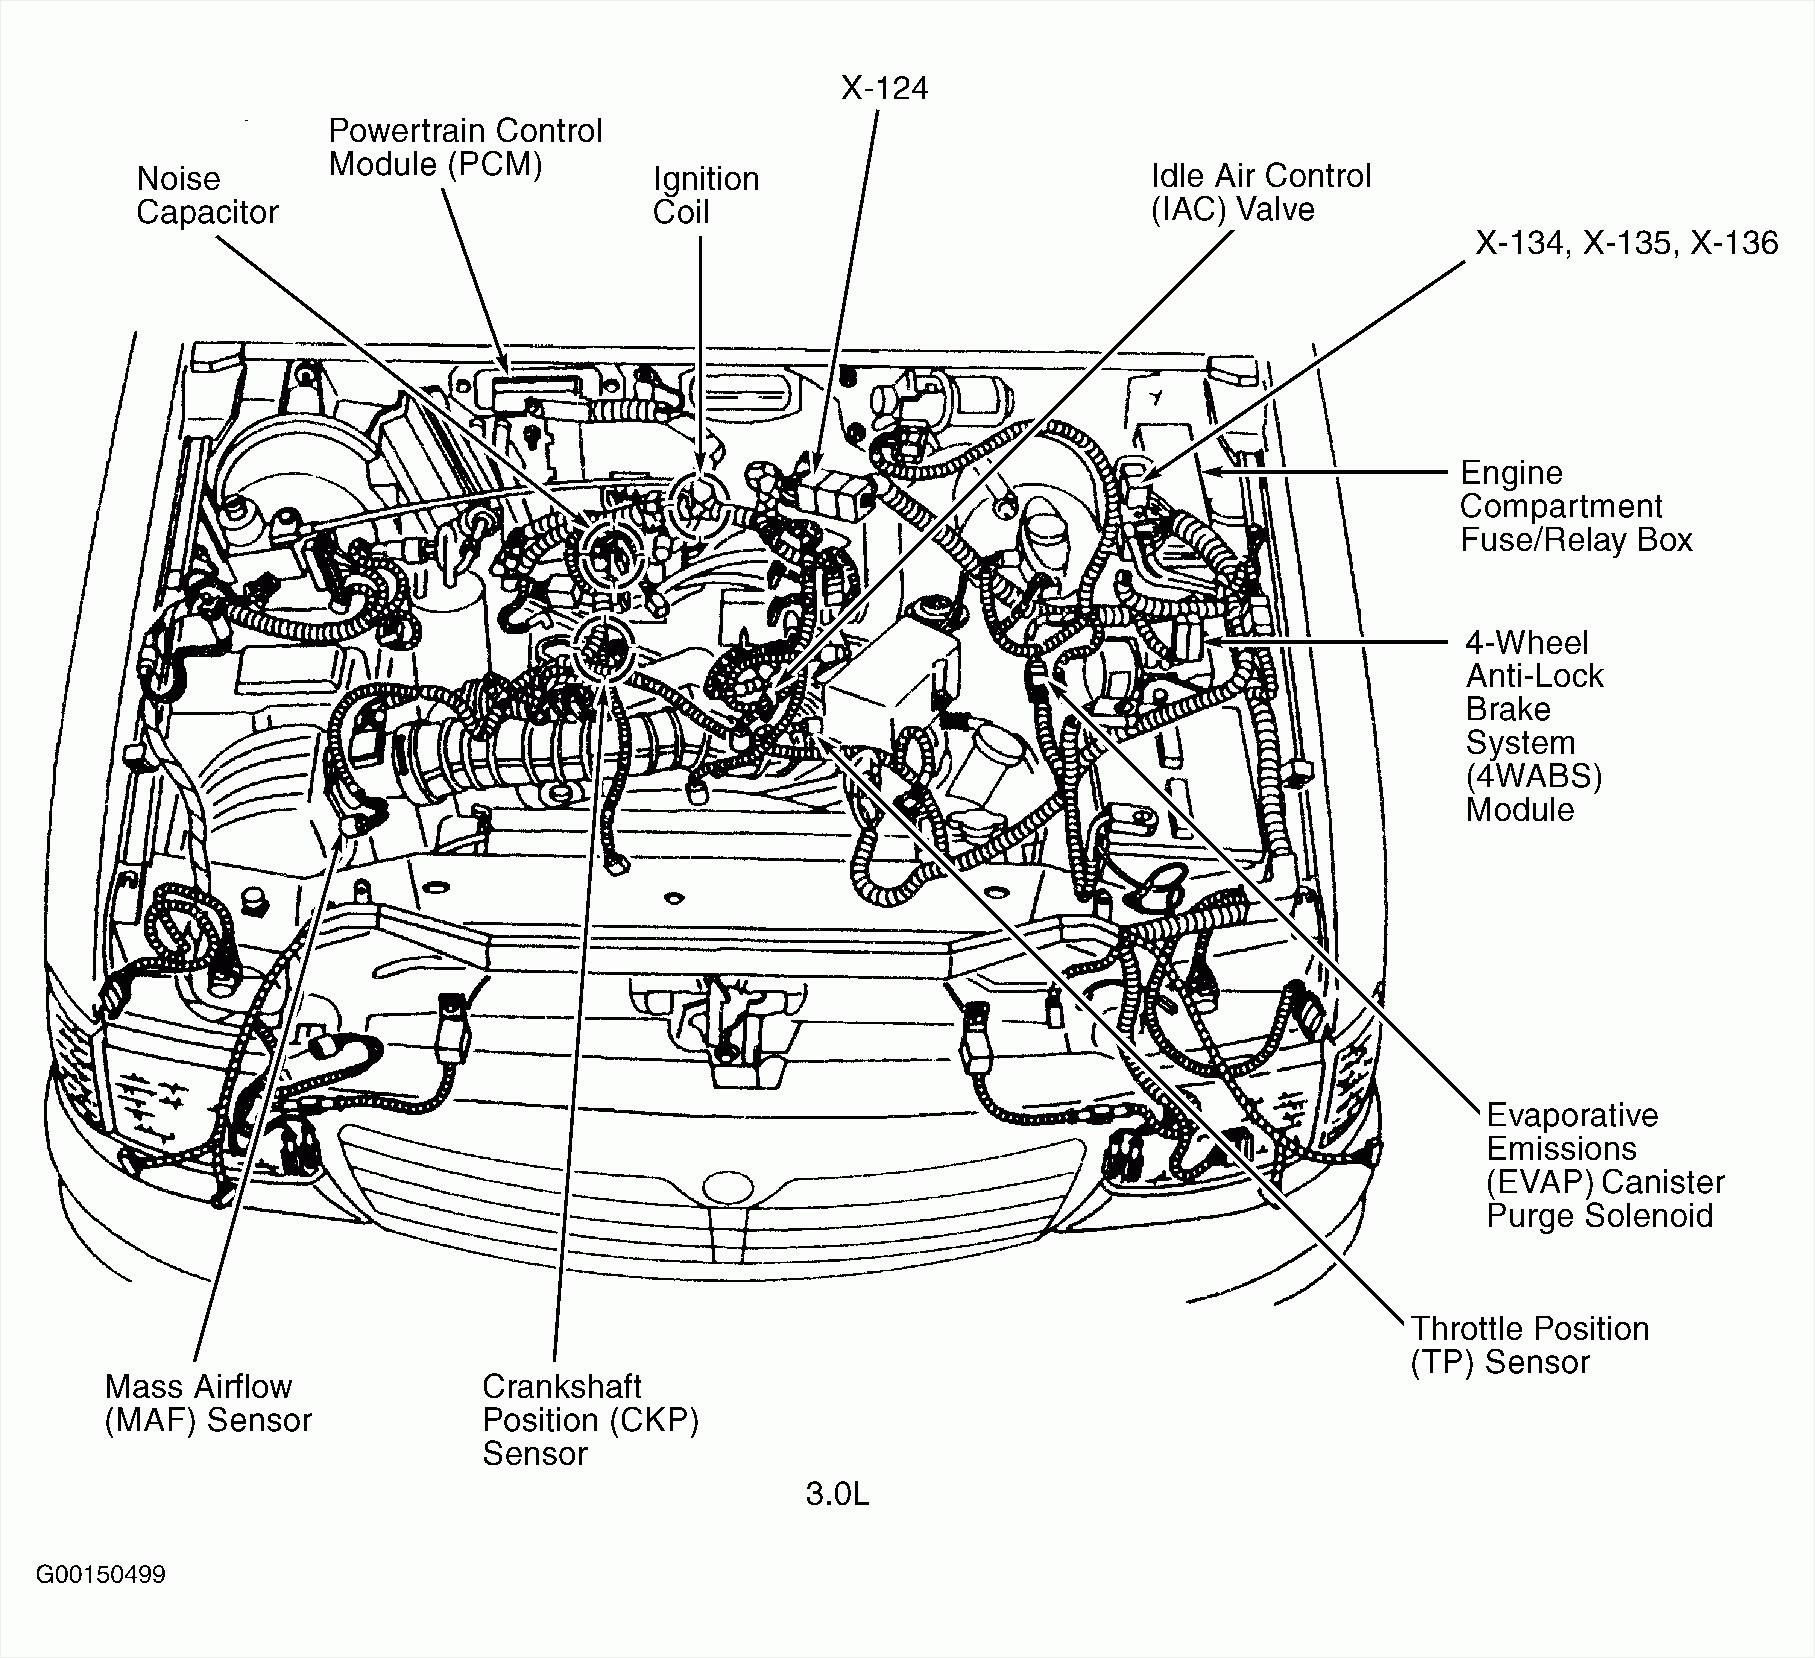 2005 ford Focus Engine Diagram ford Escape 3 0 Engine Diagram Of 2005 ford Focus Engine Diagram